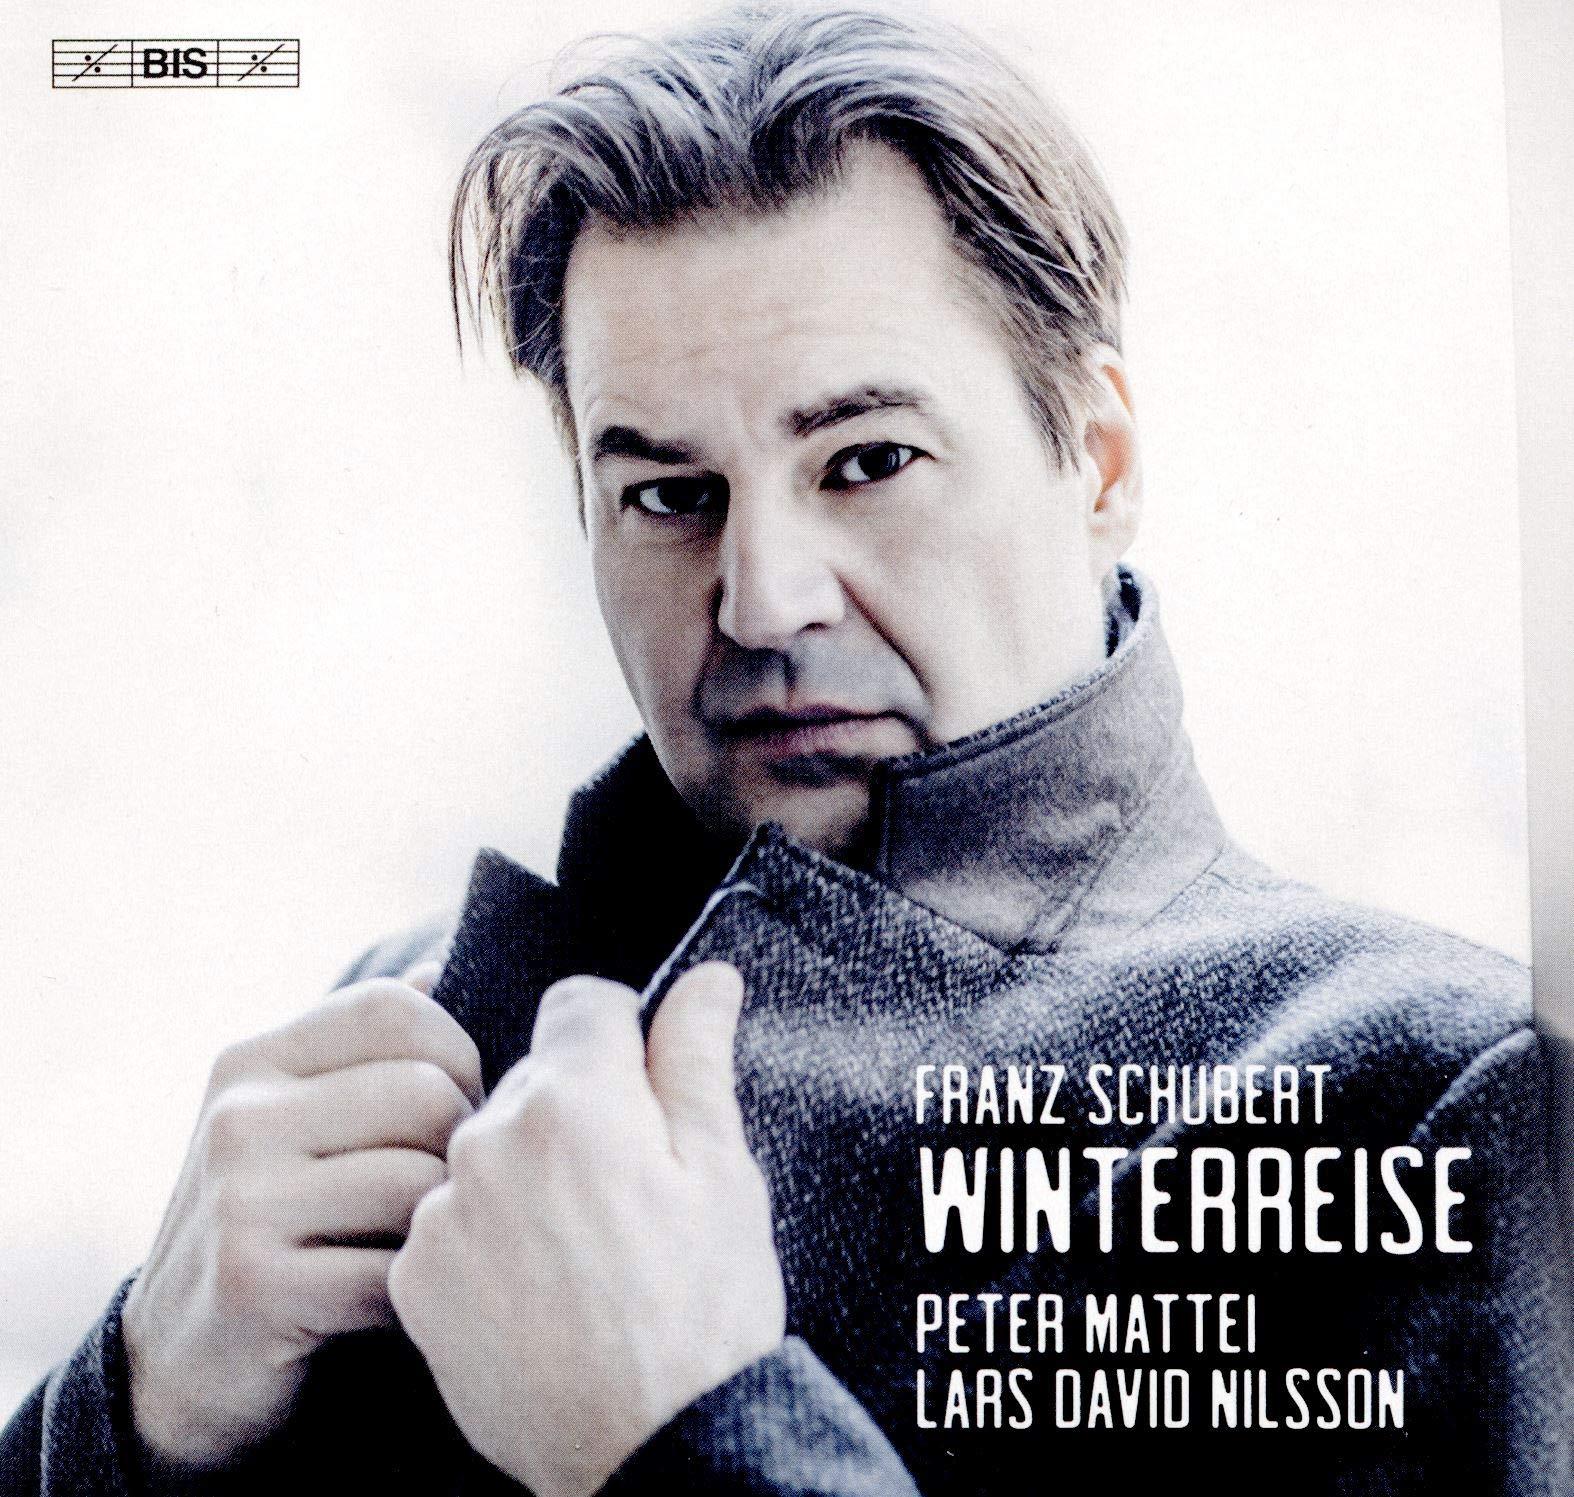 Peter Mattei & Lars David Nilsson – Franz Schubert: Winterreise (2019) [FLAC]